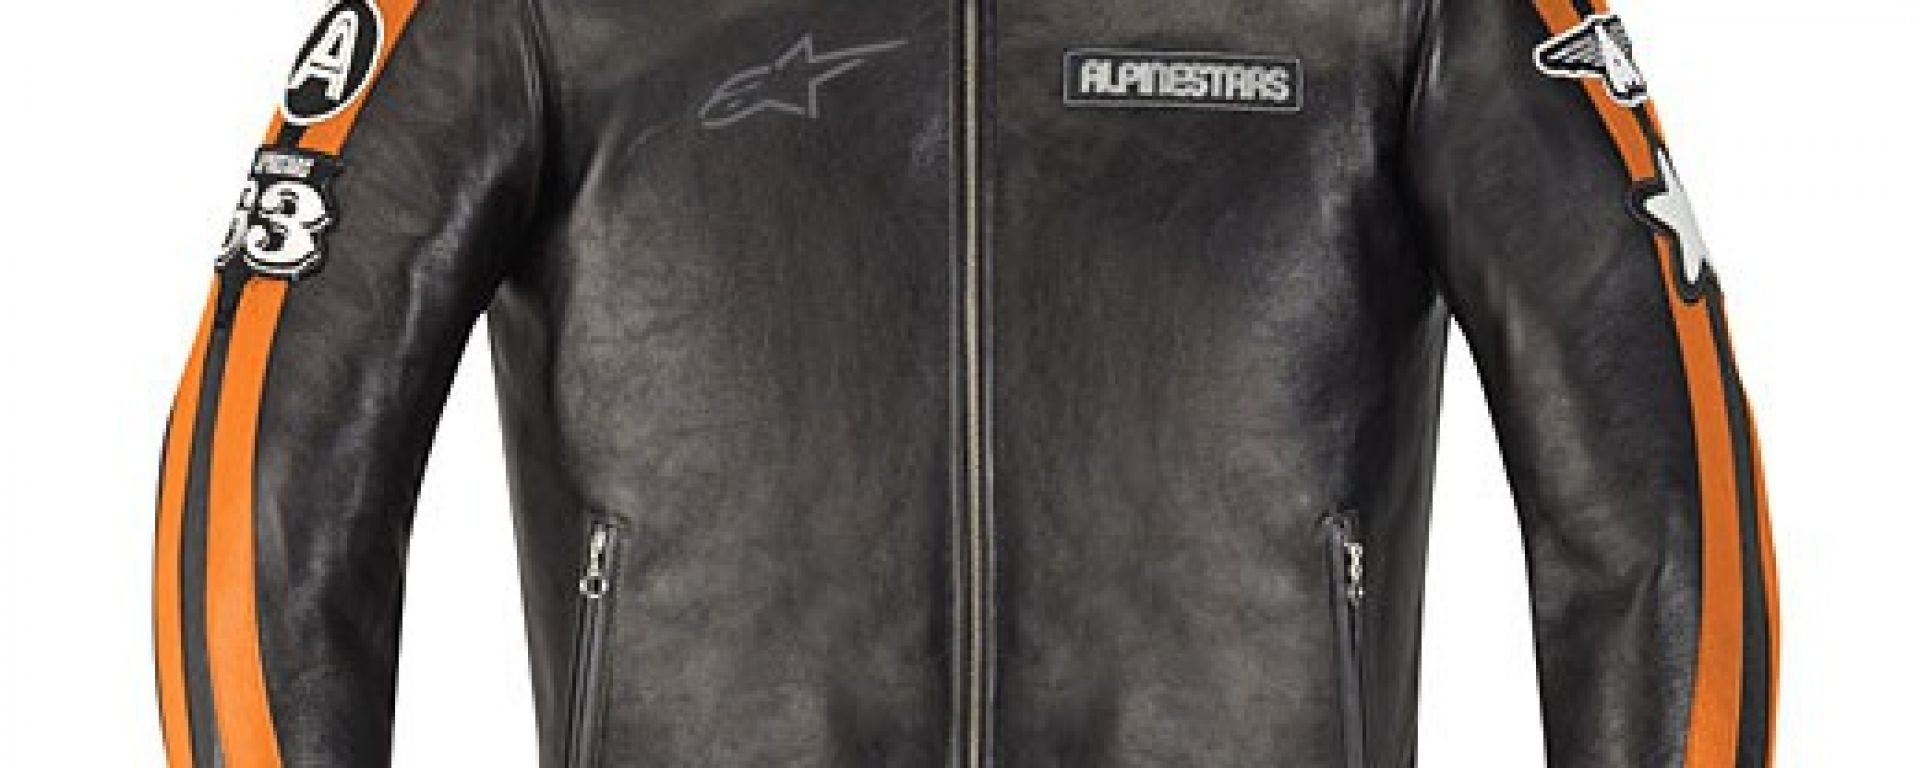 Alpinestars Velocity e Giorgia leather jacket